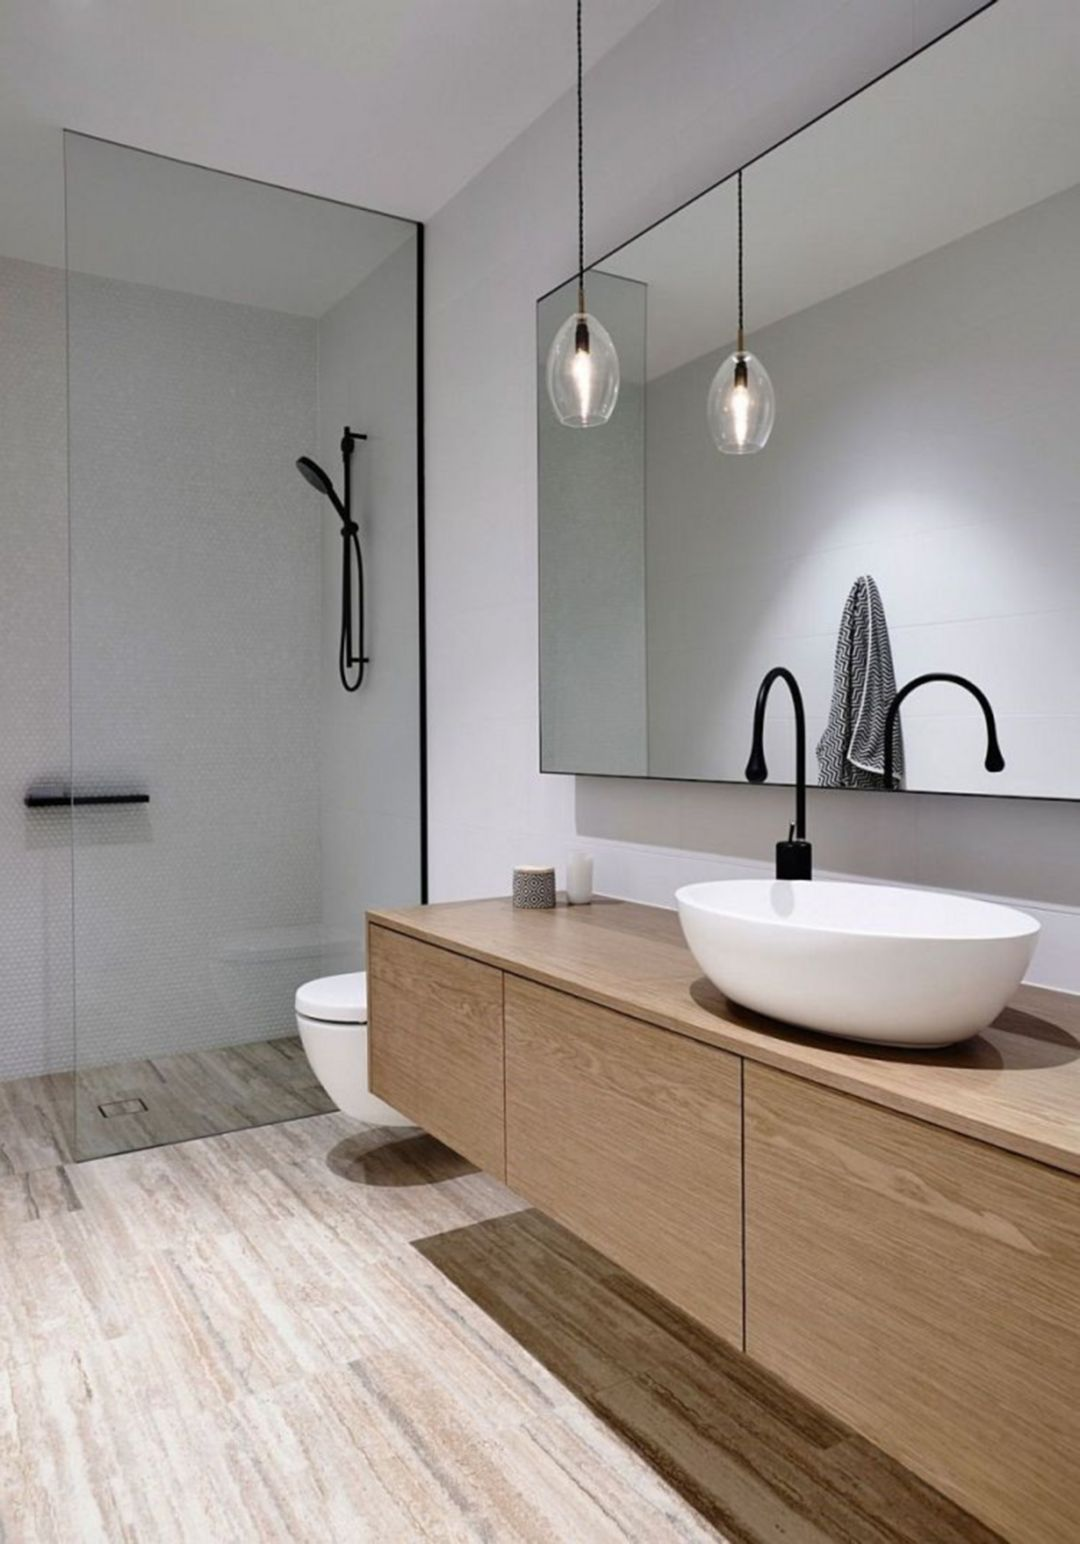 16 Contemporary Style Bathroom Design Ideas For Your Convenience Modern Bathroom Bathroom Design Modern Bathroom Decor